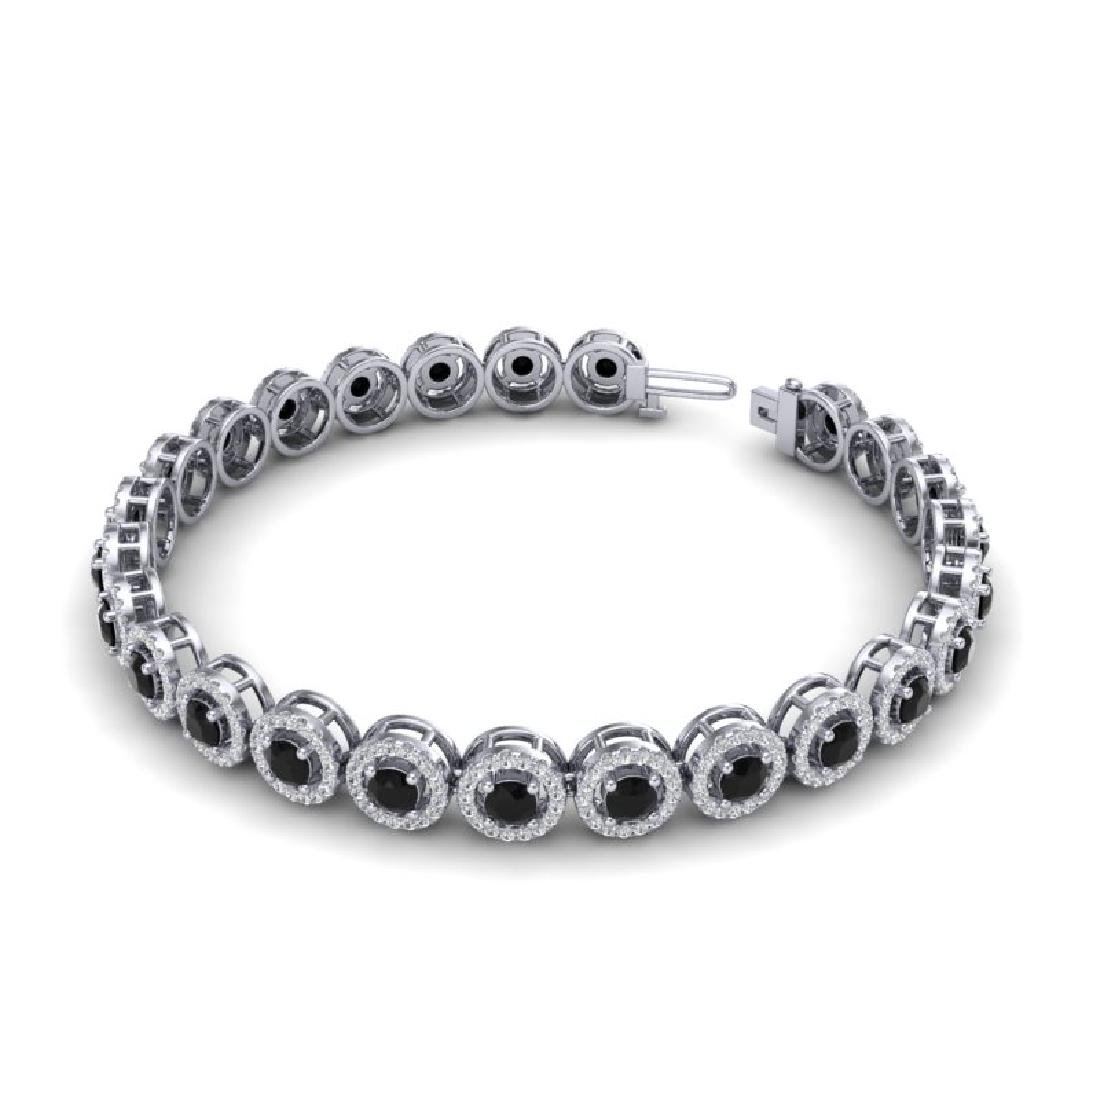 8.75 CTW Micro Pave VS/SI Diamond Bracelet Solitaire - 2